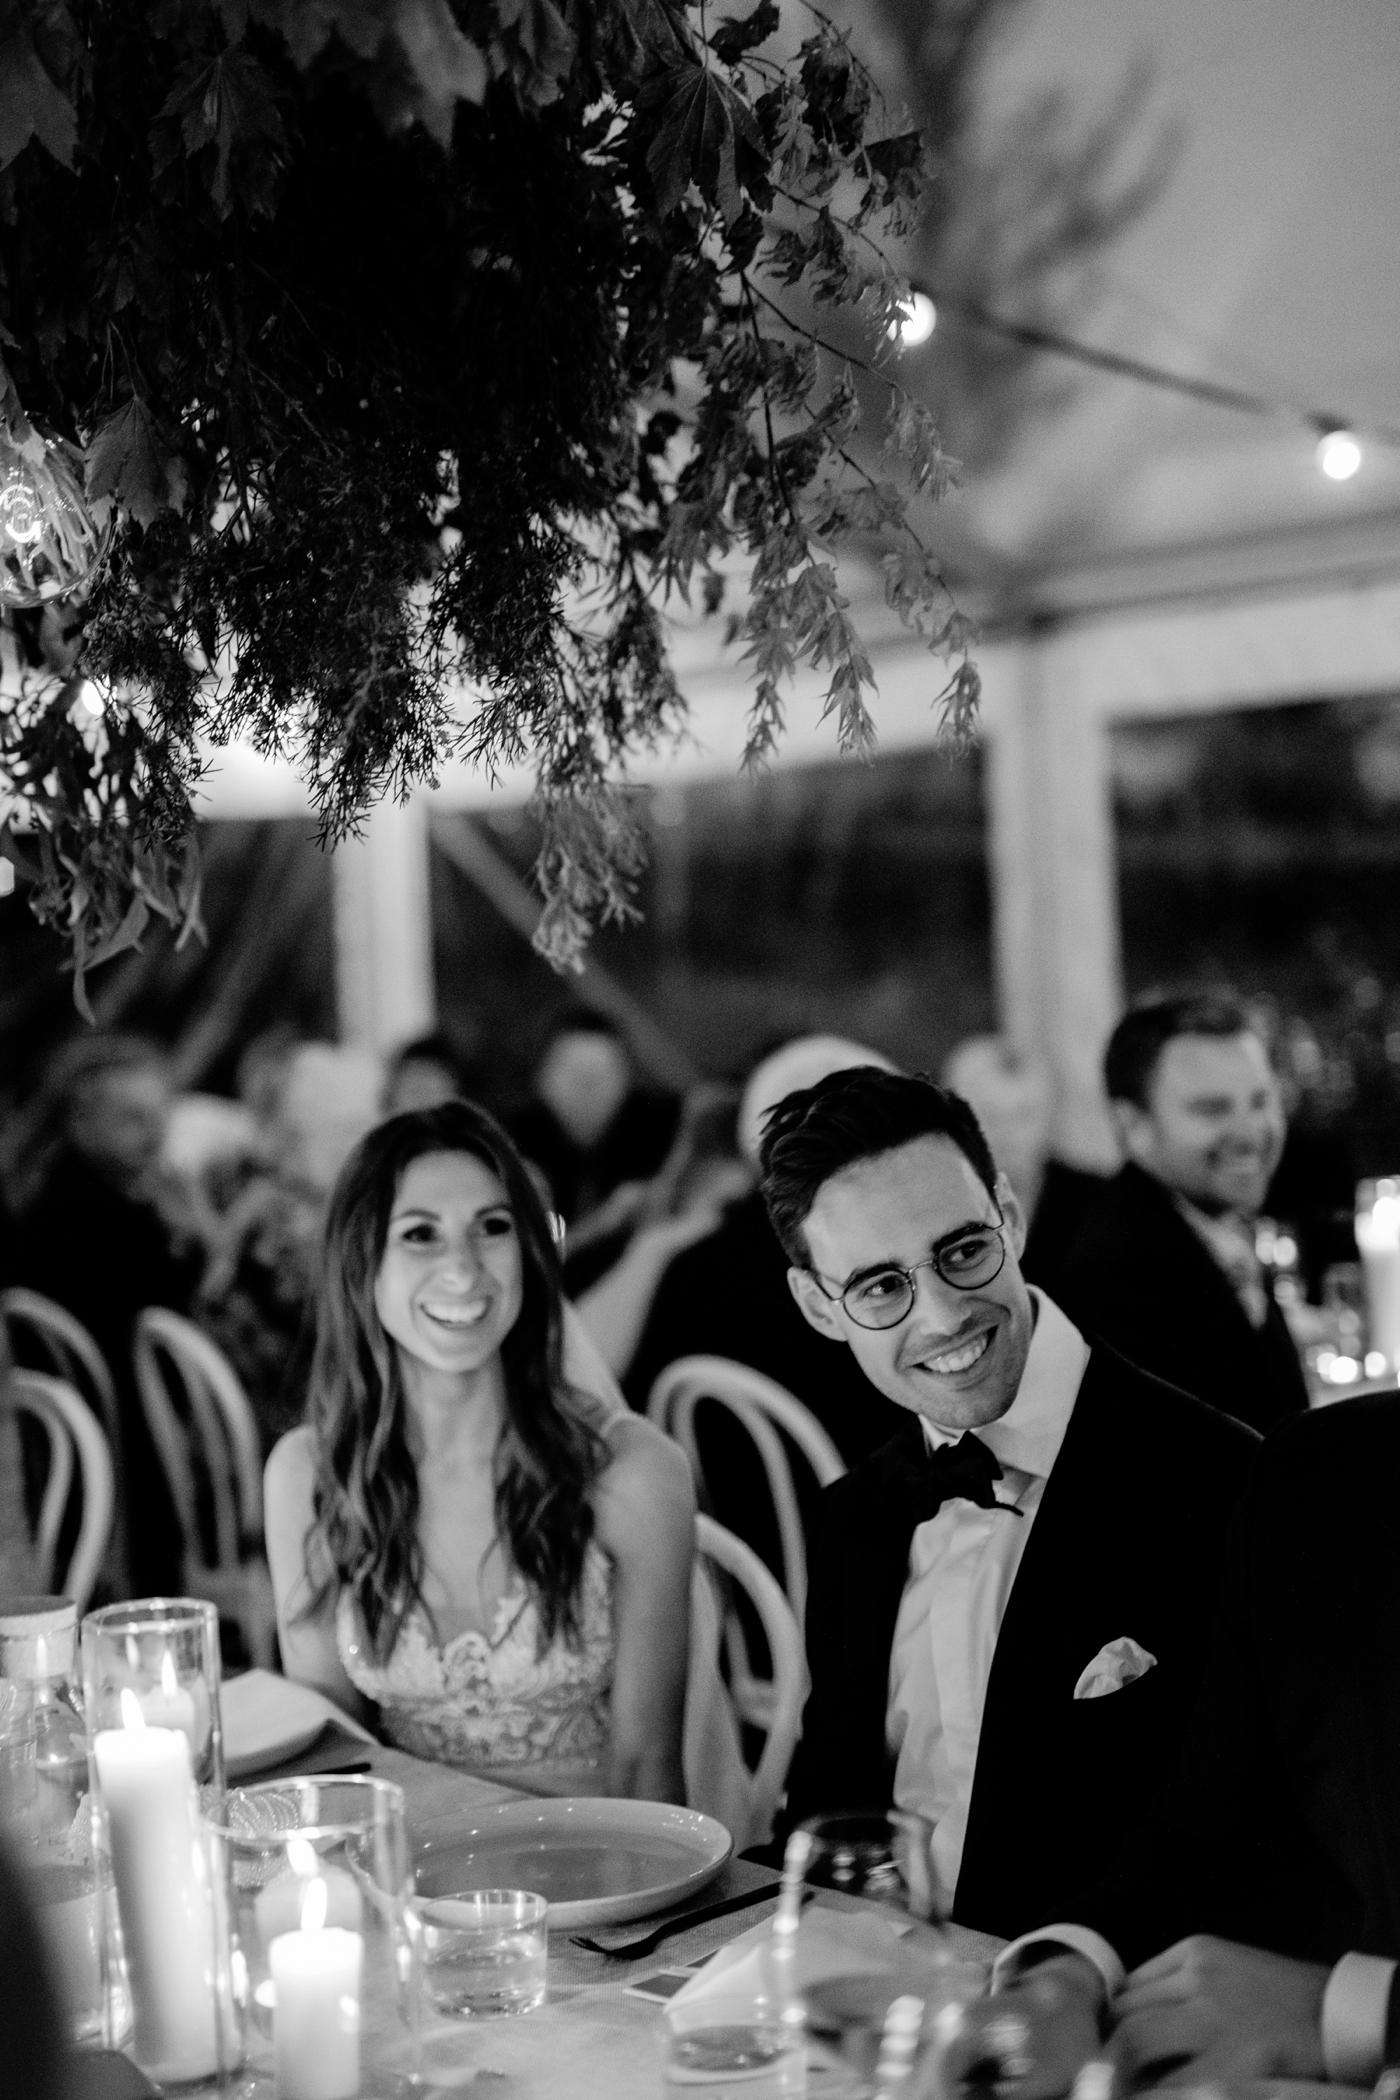 Katie and Ben - Natural Wedding Photography in Adelaide - Beautiful, Candid Wedding Photographer - Adelaide Hills Wedding - Katherine Schultz - www.katherineschultzphotography.com_0071.jpg